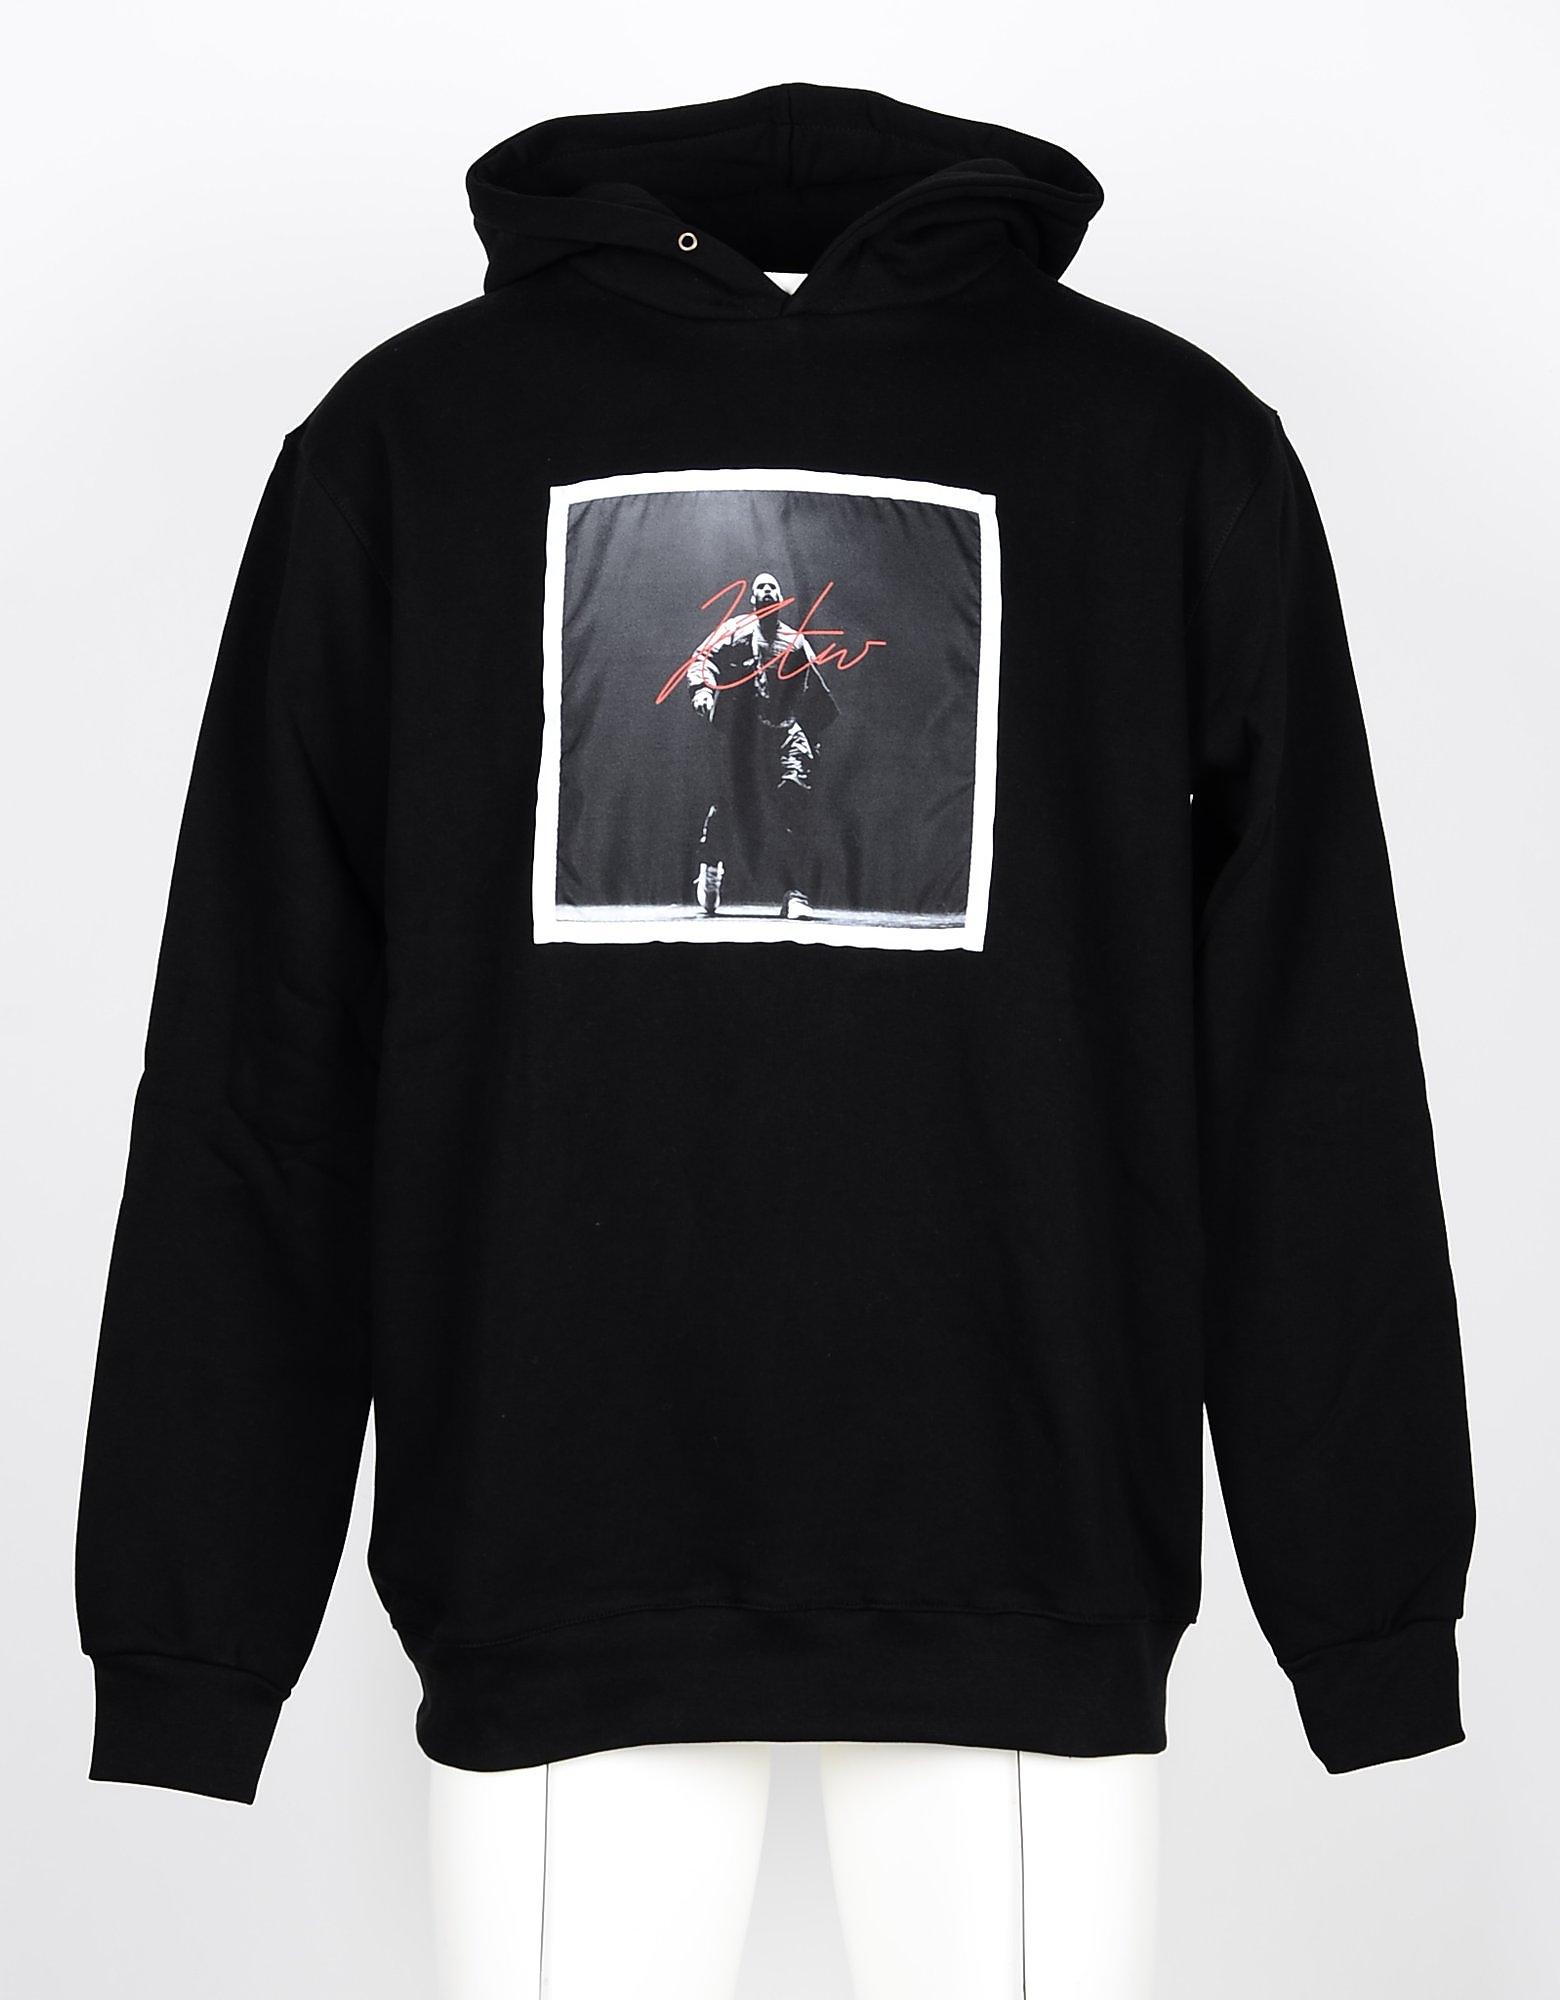 Kissing the War Designer Sweatshirts, Black Cotton Signature Print Men's Hoodie